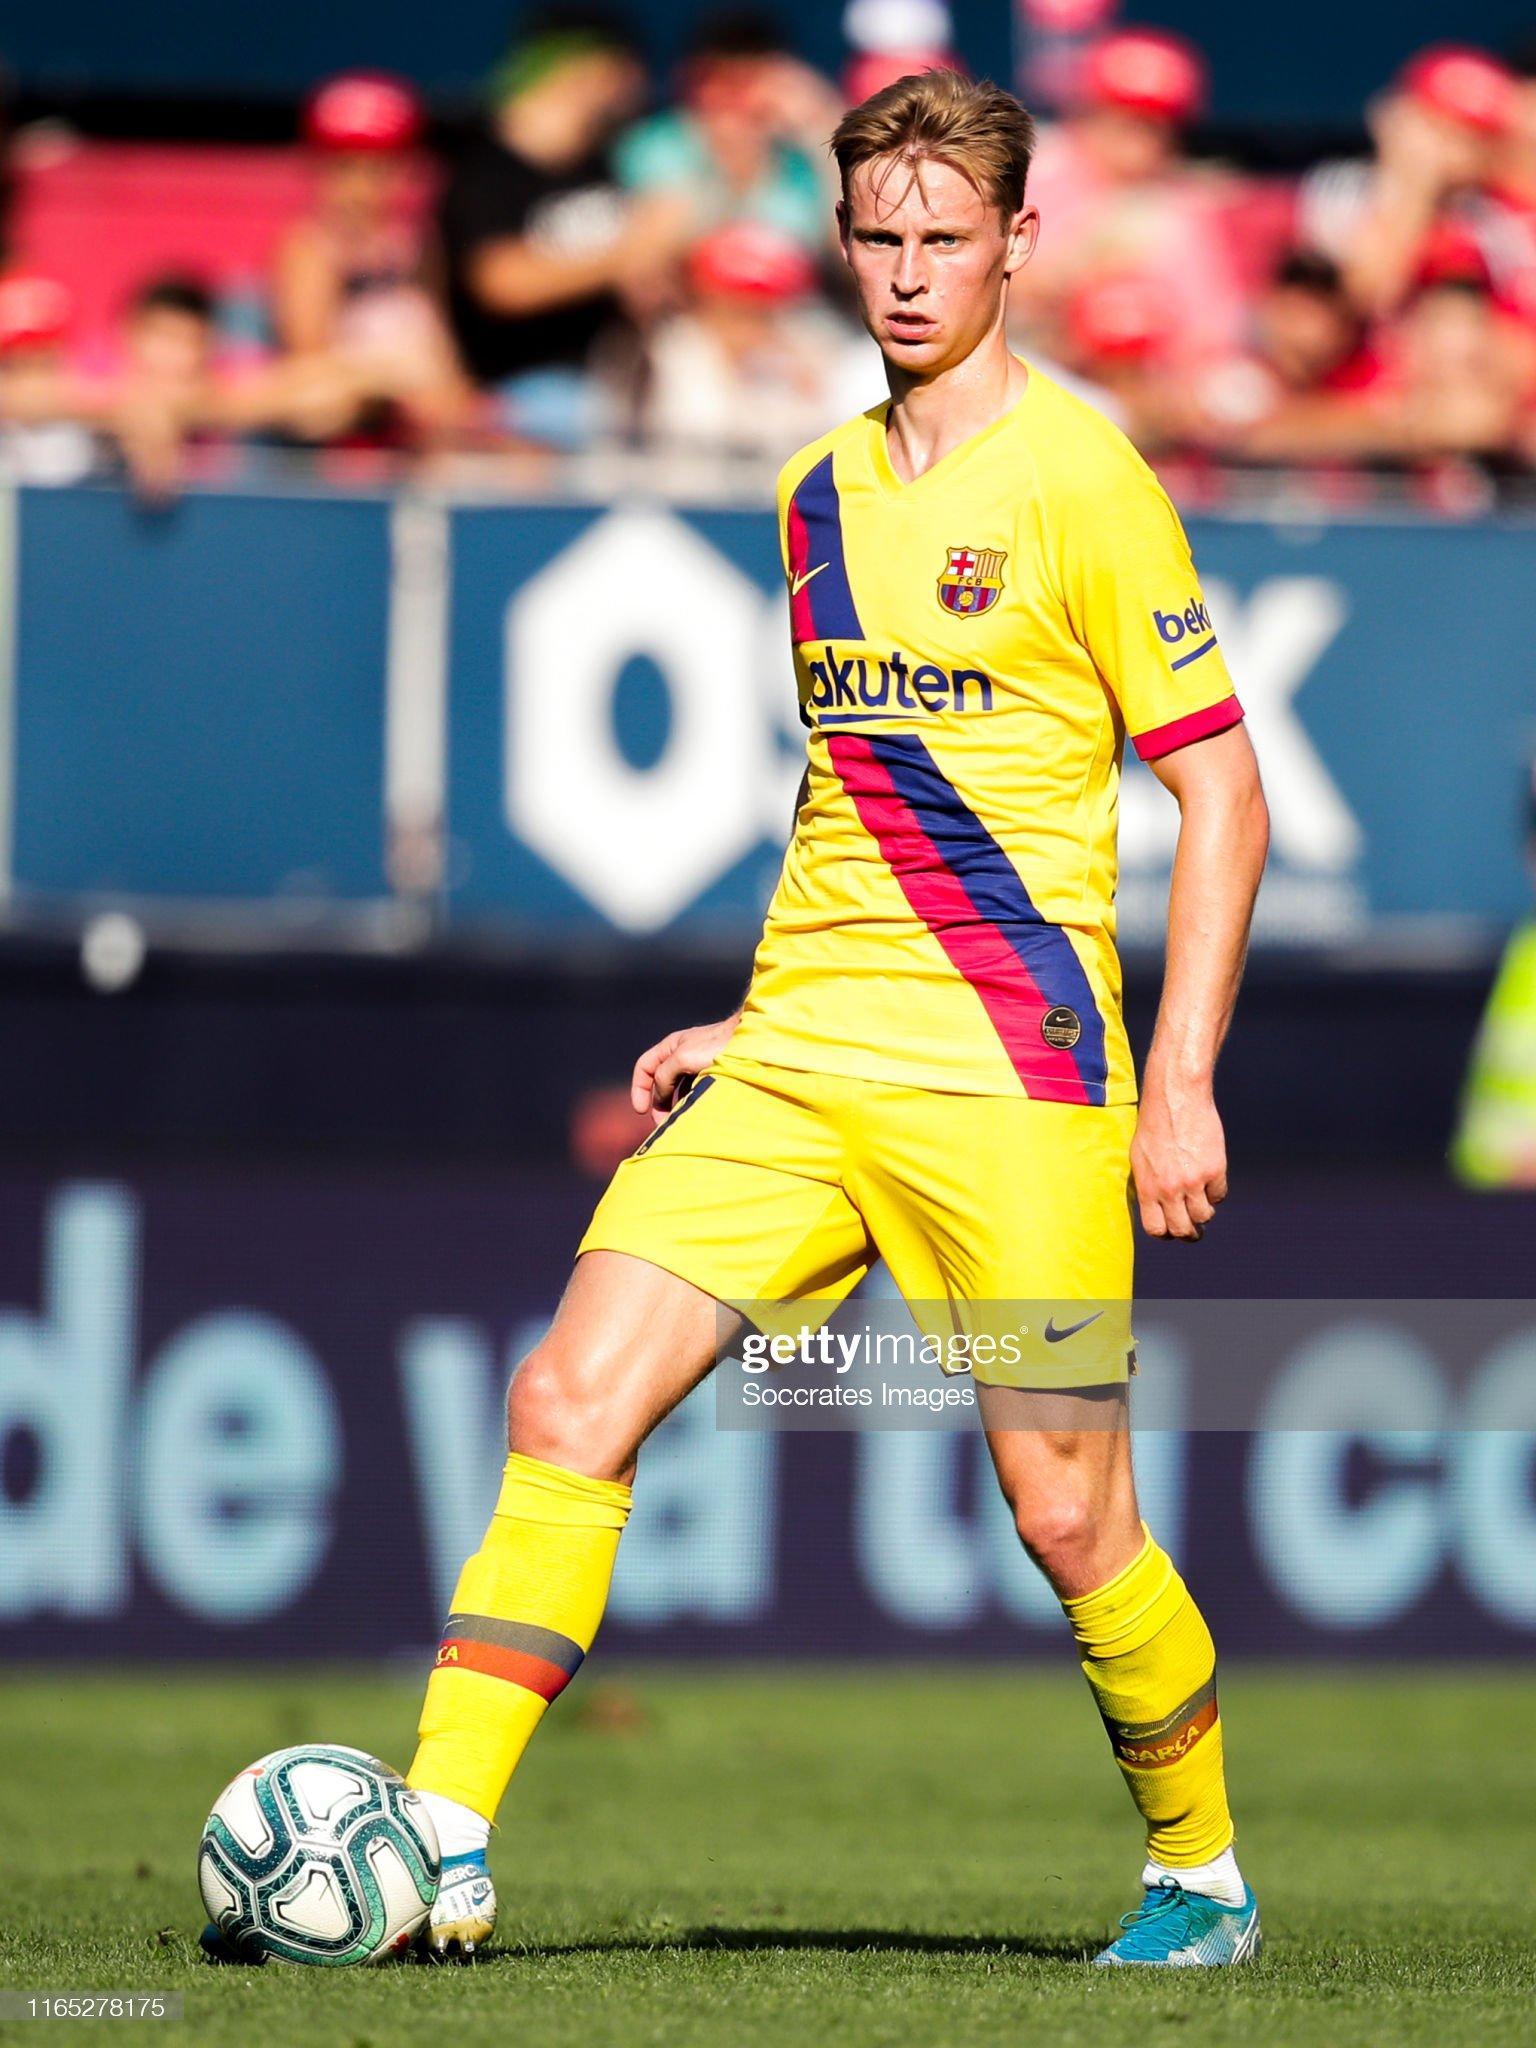 صور مباراة : أوساسونا - برشلونة 2-2 ( 31-08-2019 )  Frenkie-de-jong-of-fc-barcelona-during-the-la-liga-santander-match-picture-id1165278175?s=2048x2048